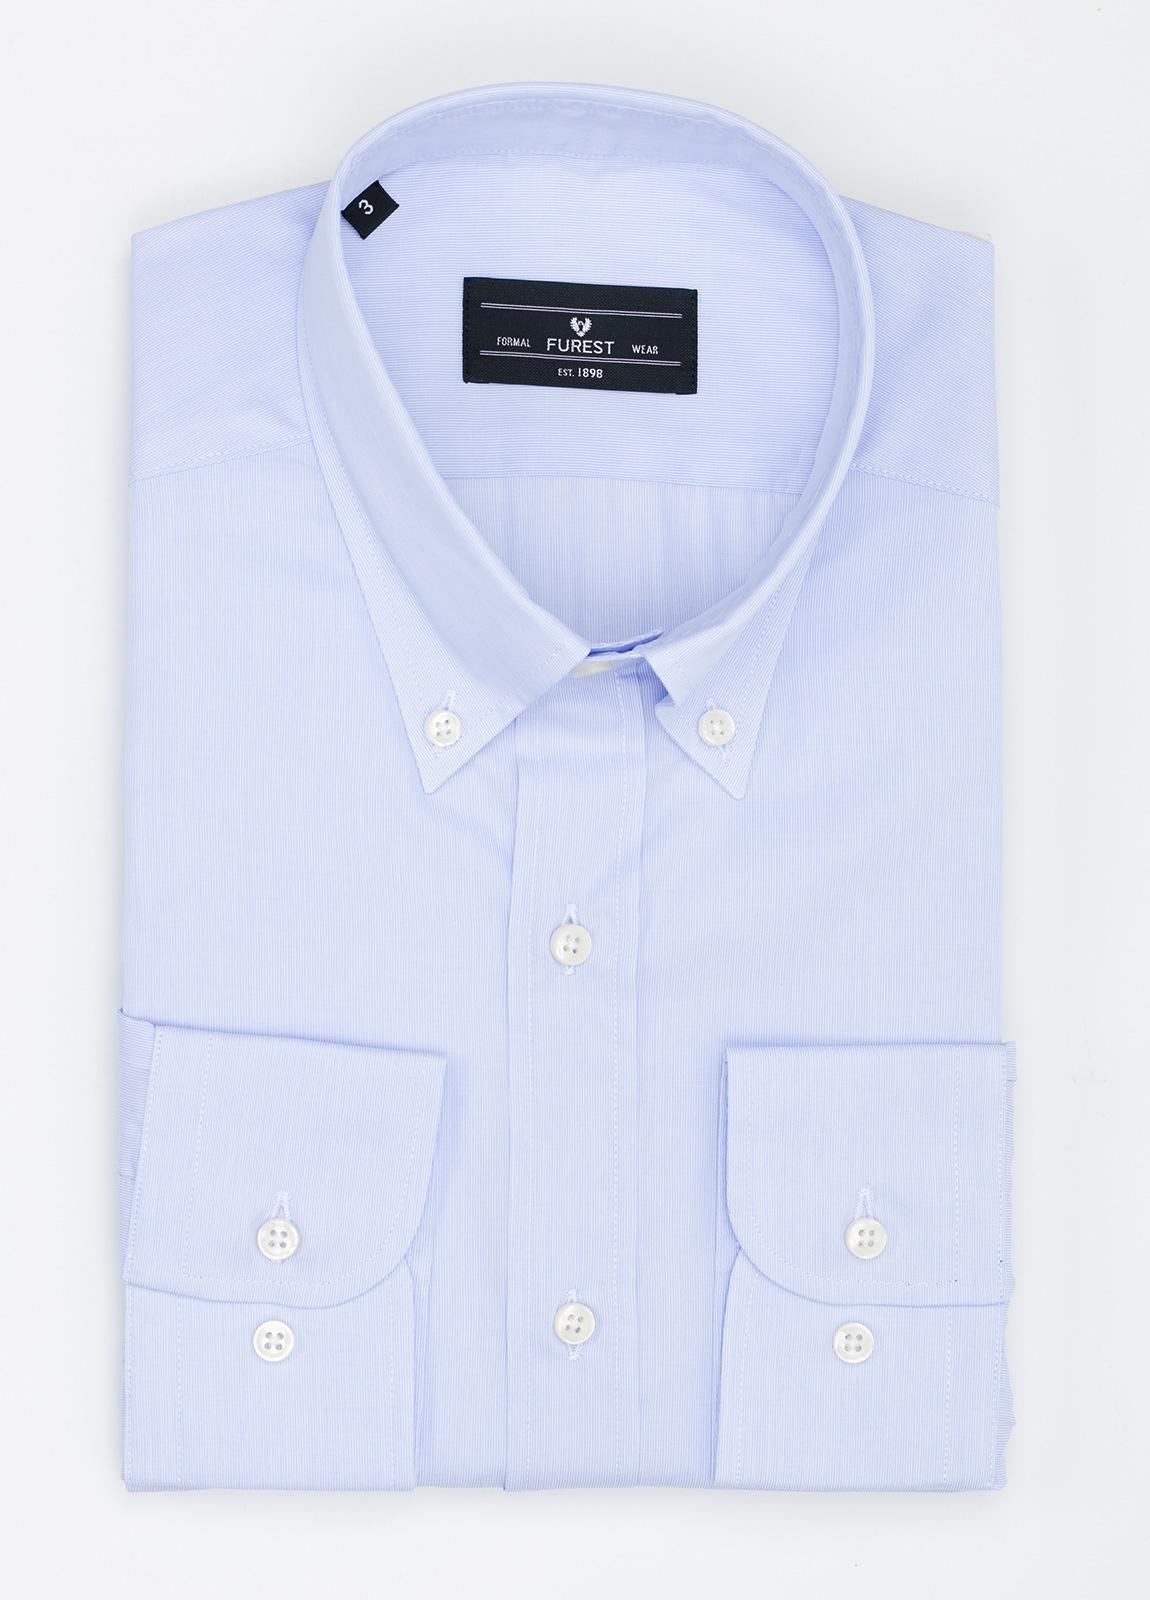 Camisa Formal Wear REGULAR FIT modelo BOTTON DOWN tejido pique color azul. 100% Algodón.